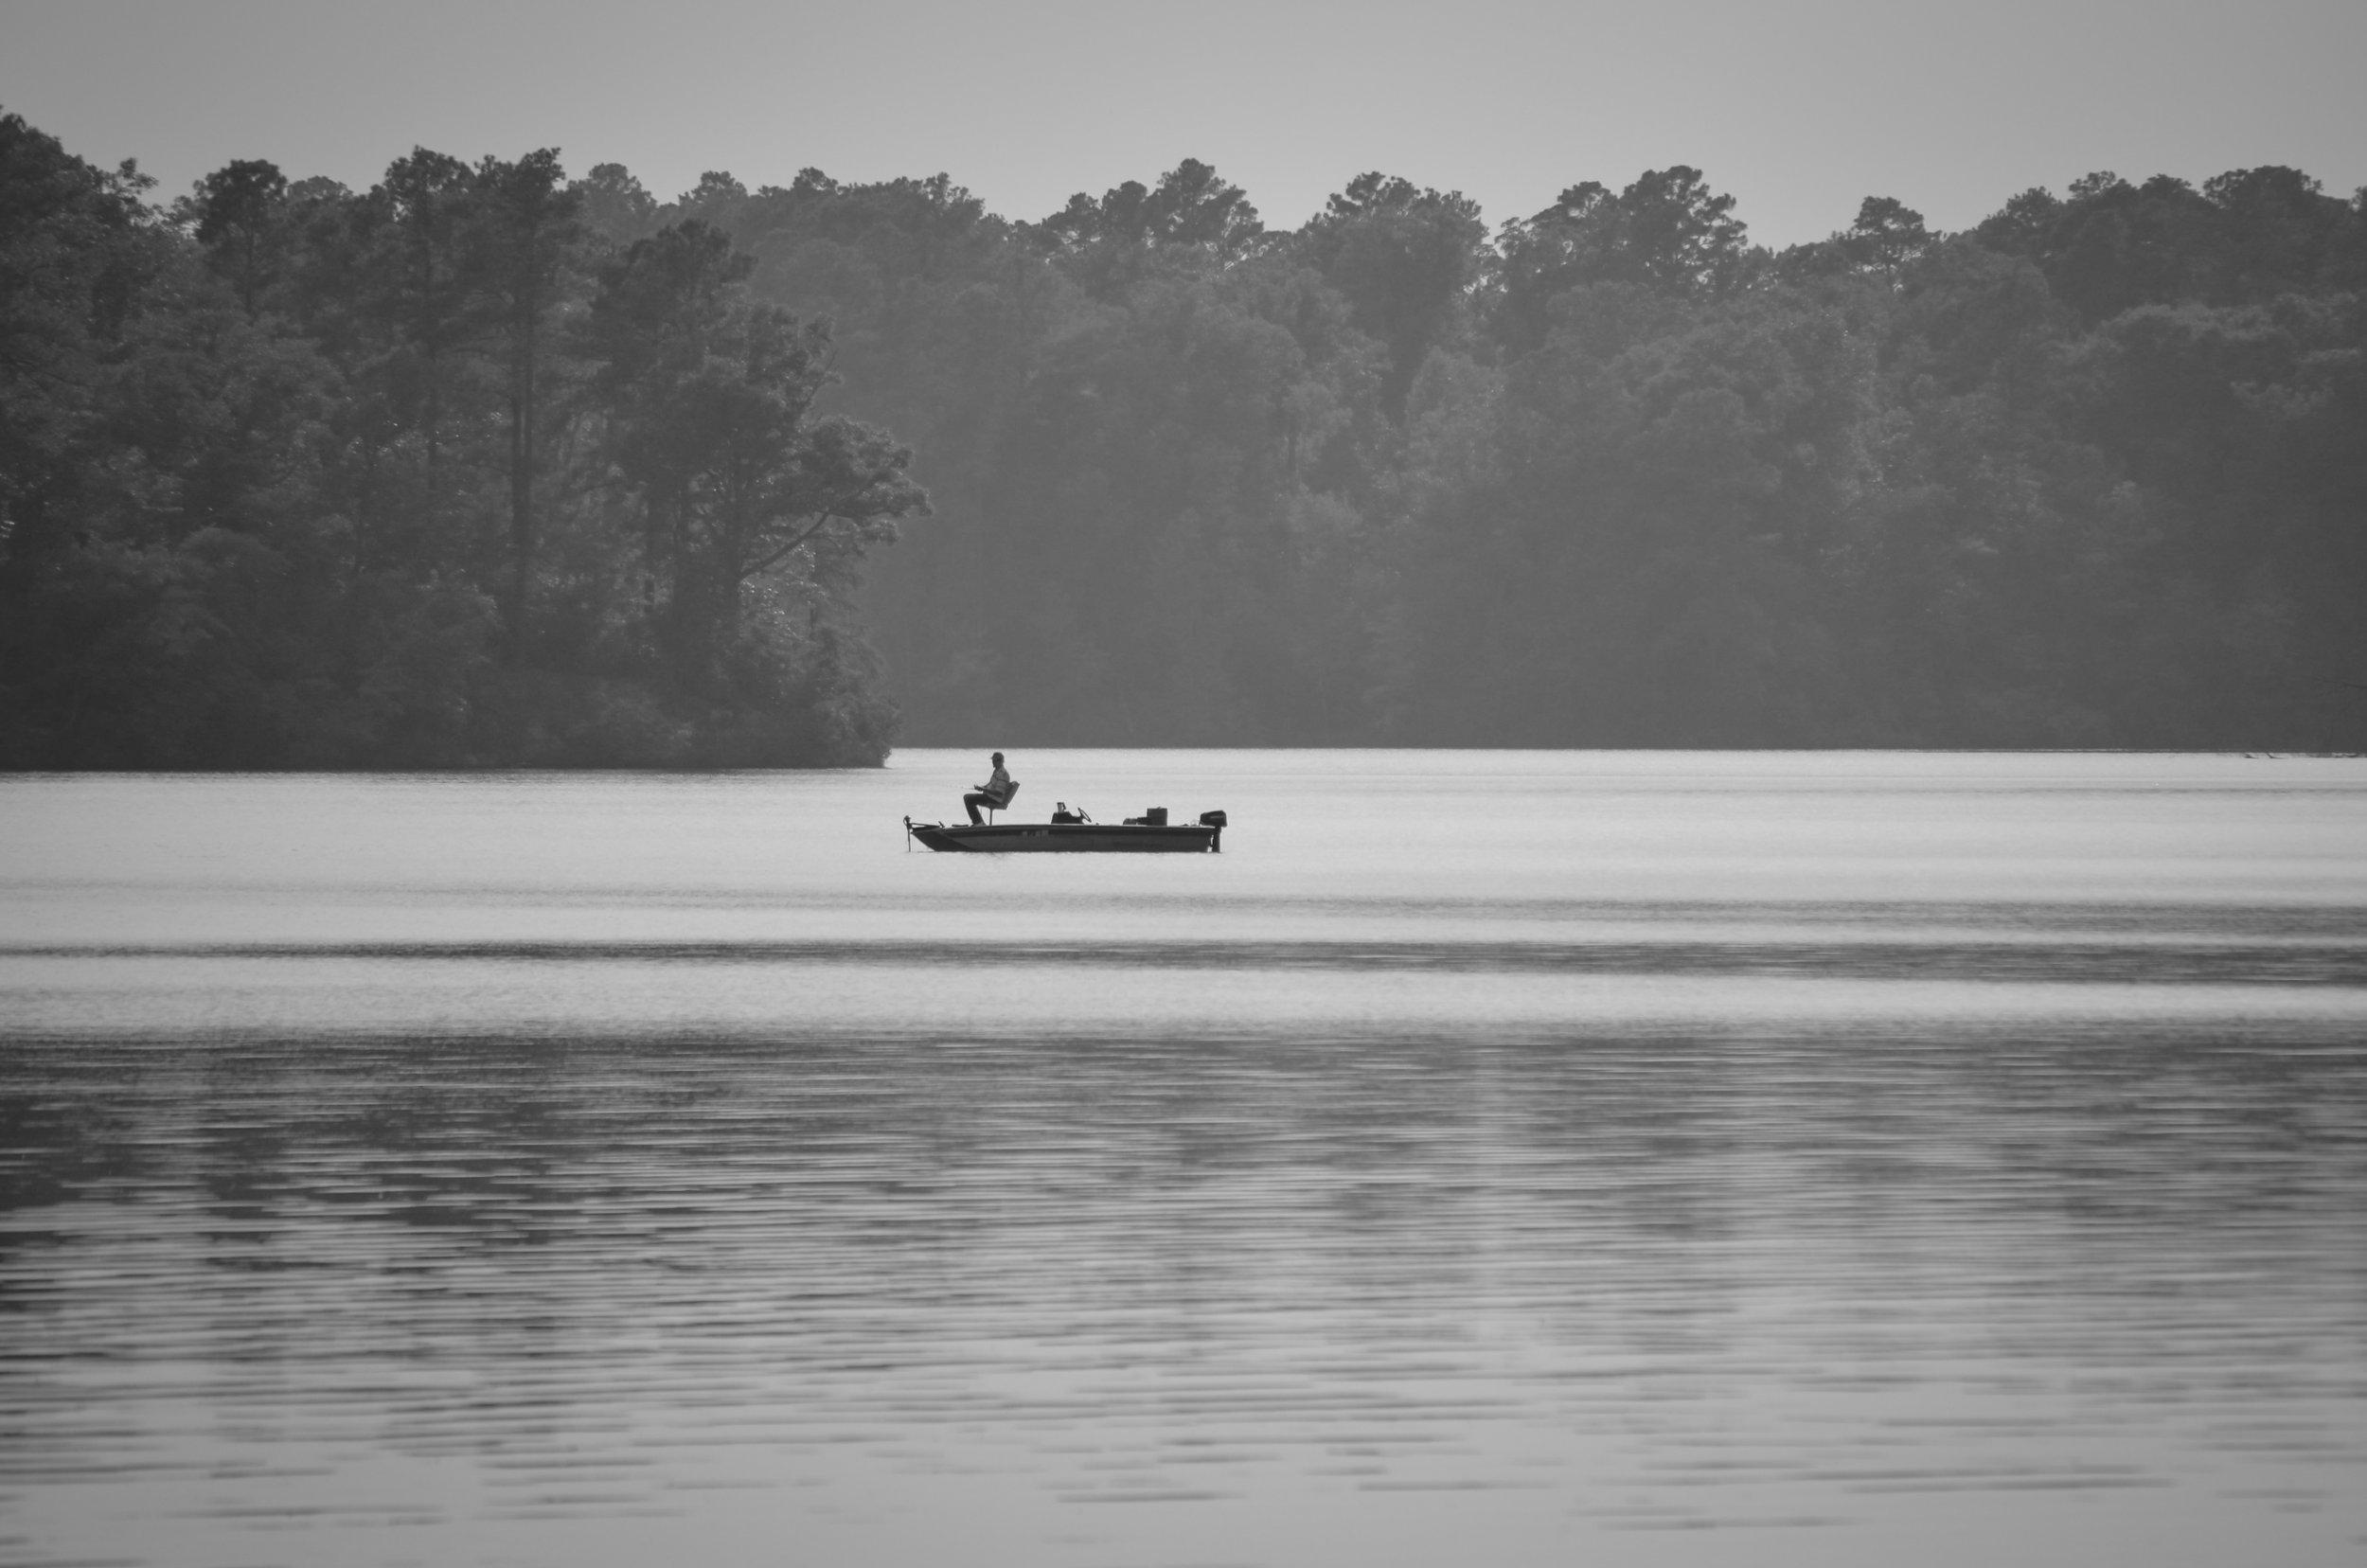 black and white-fishing-lake burnt mills-suffolk-isle of wight county-virginia.jpg